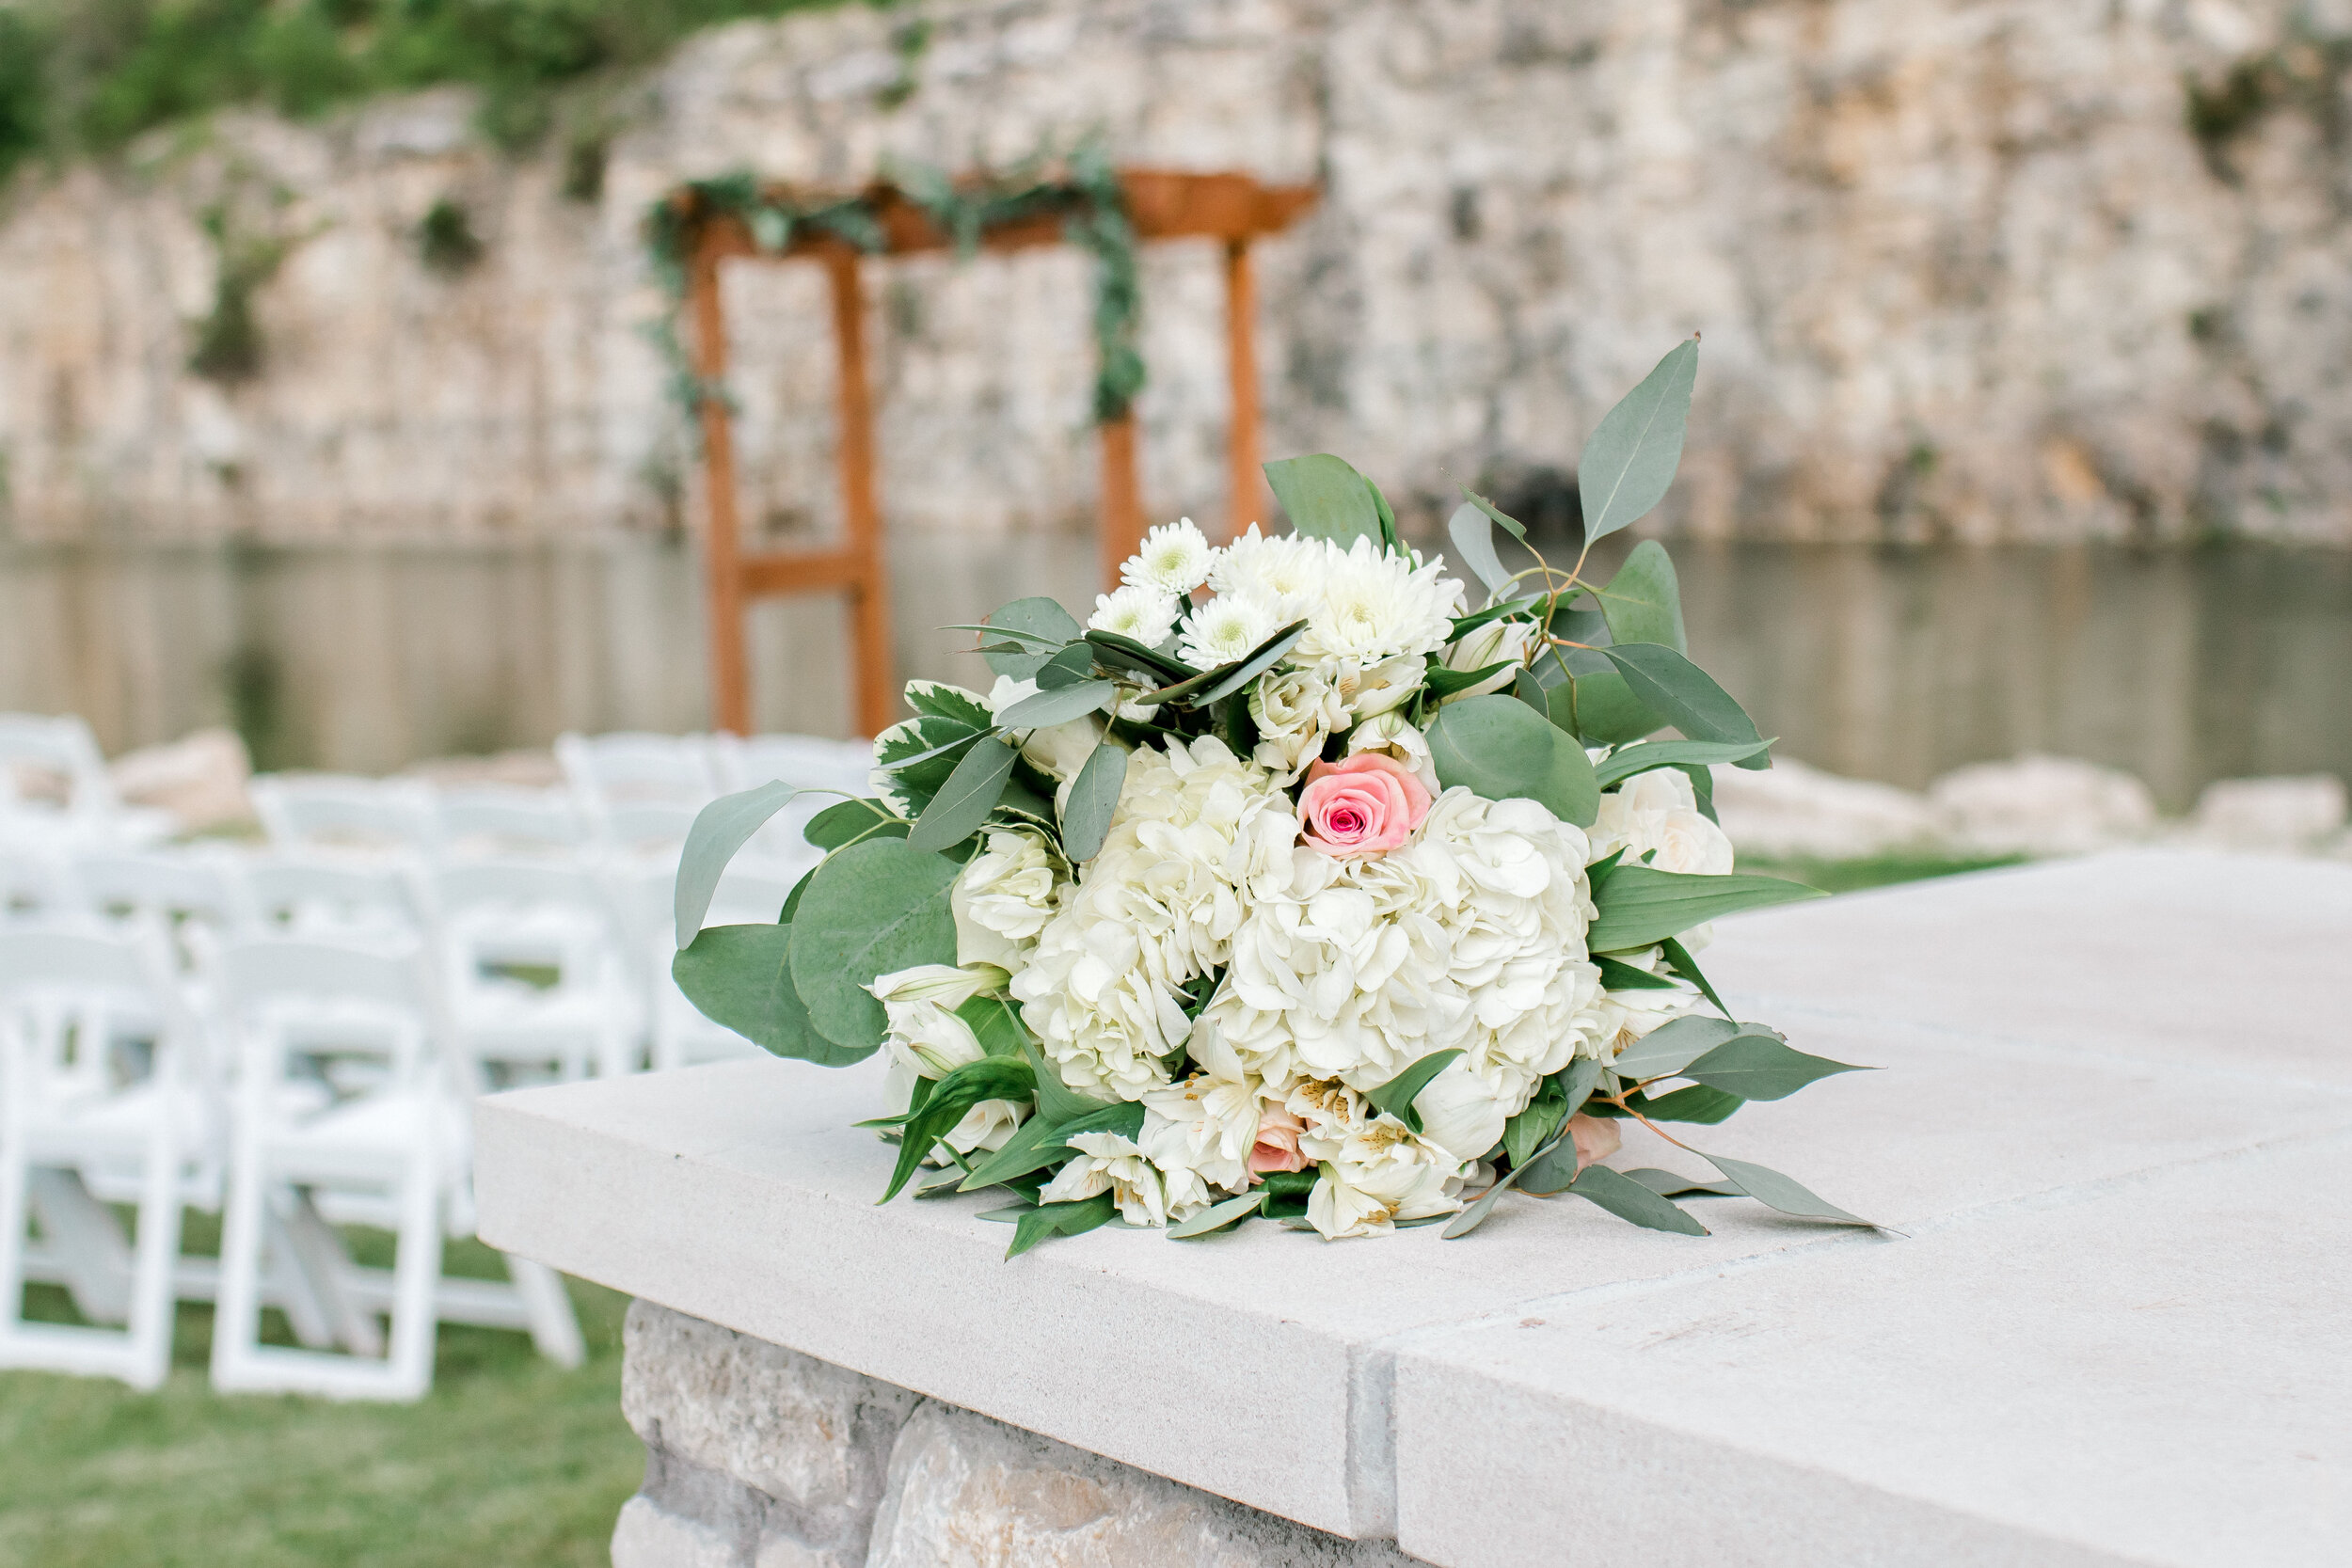 060719_Wedding_Kristin_Chris (59 of 402).jpg